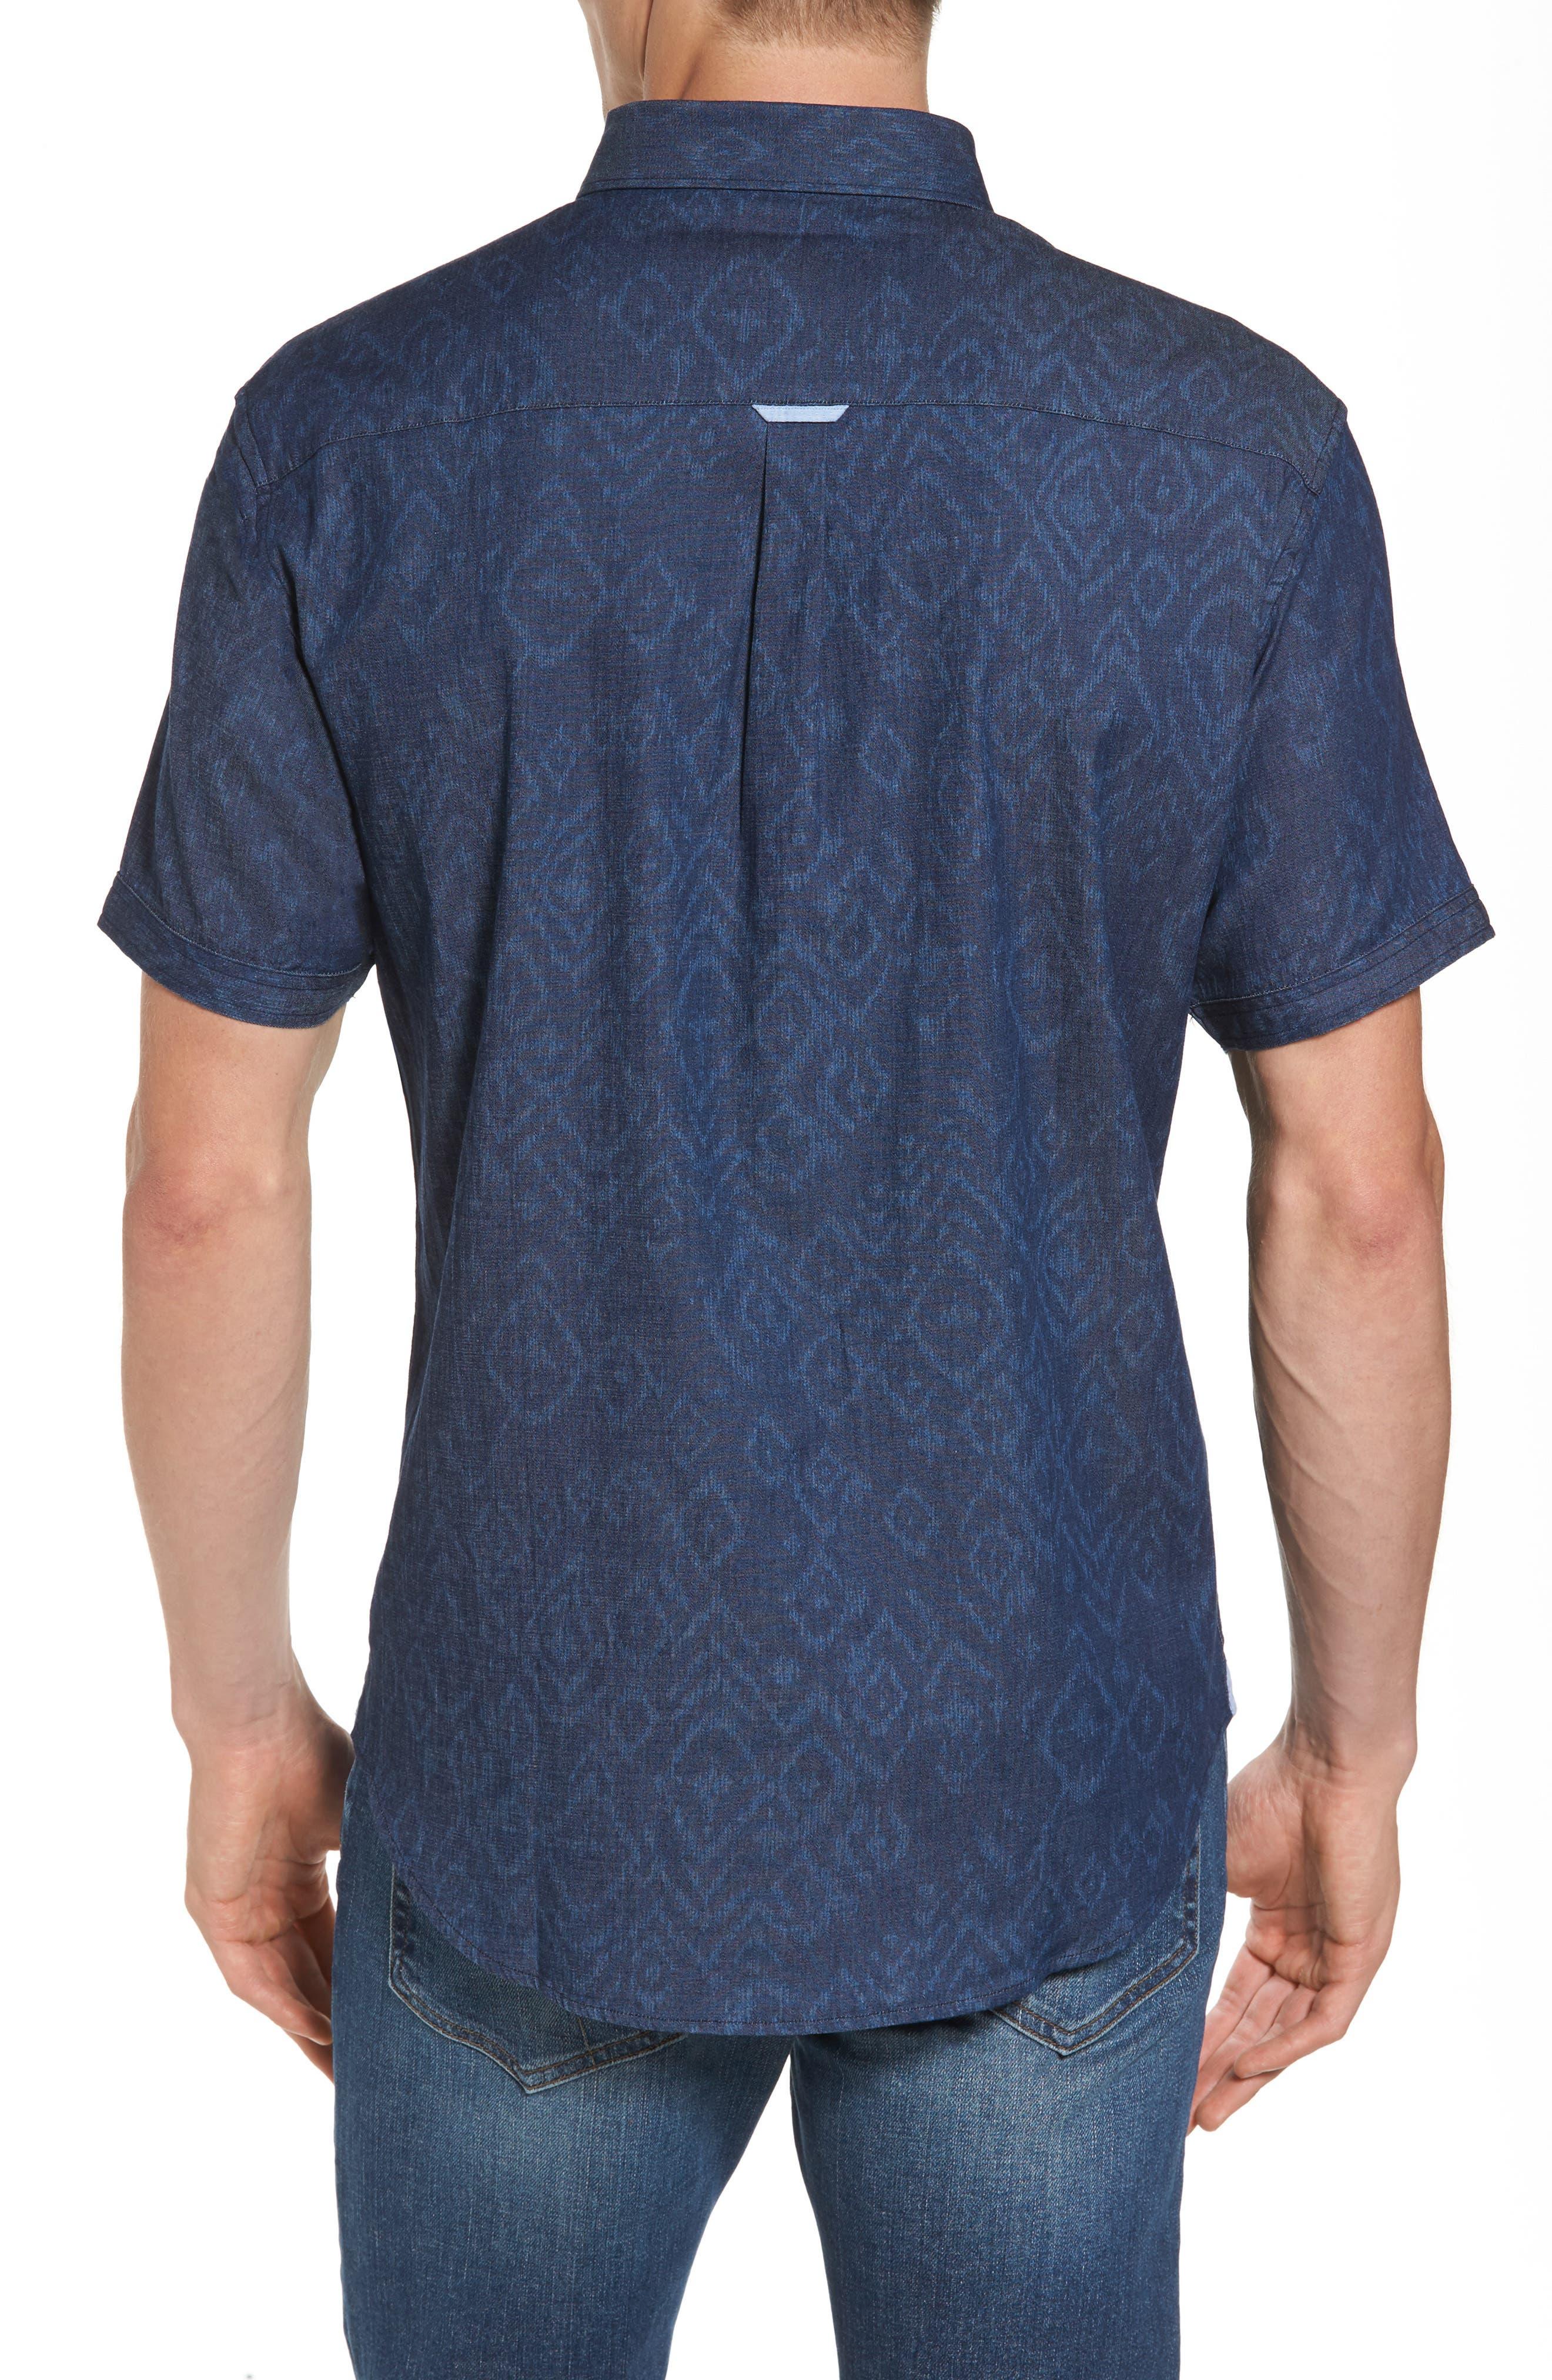 Marquee Moon Print Woven Shirt,                             Alternate thumbnail 2, color,                             410